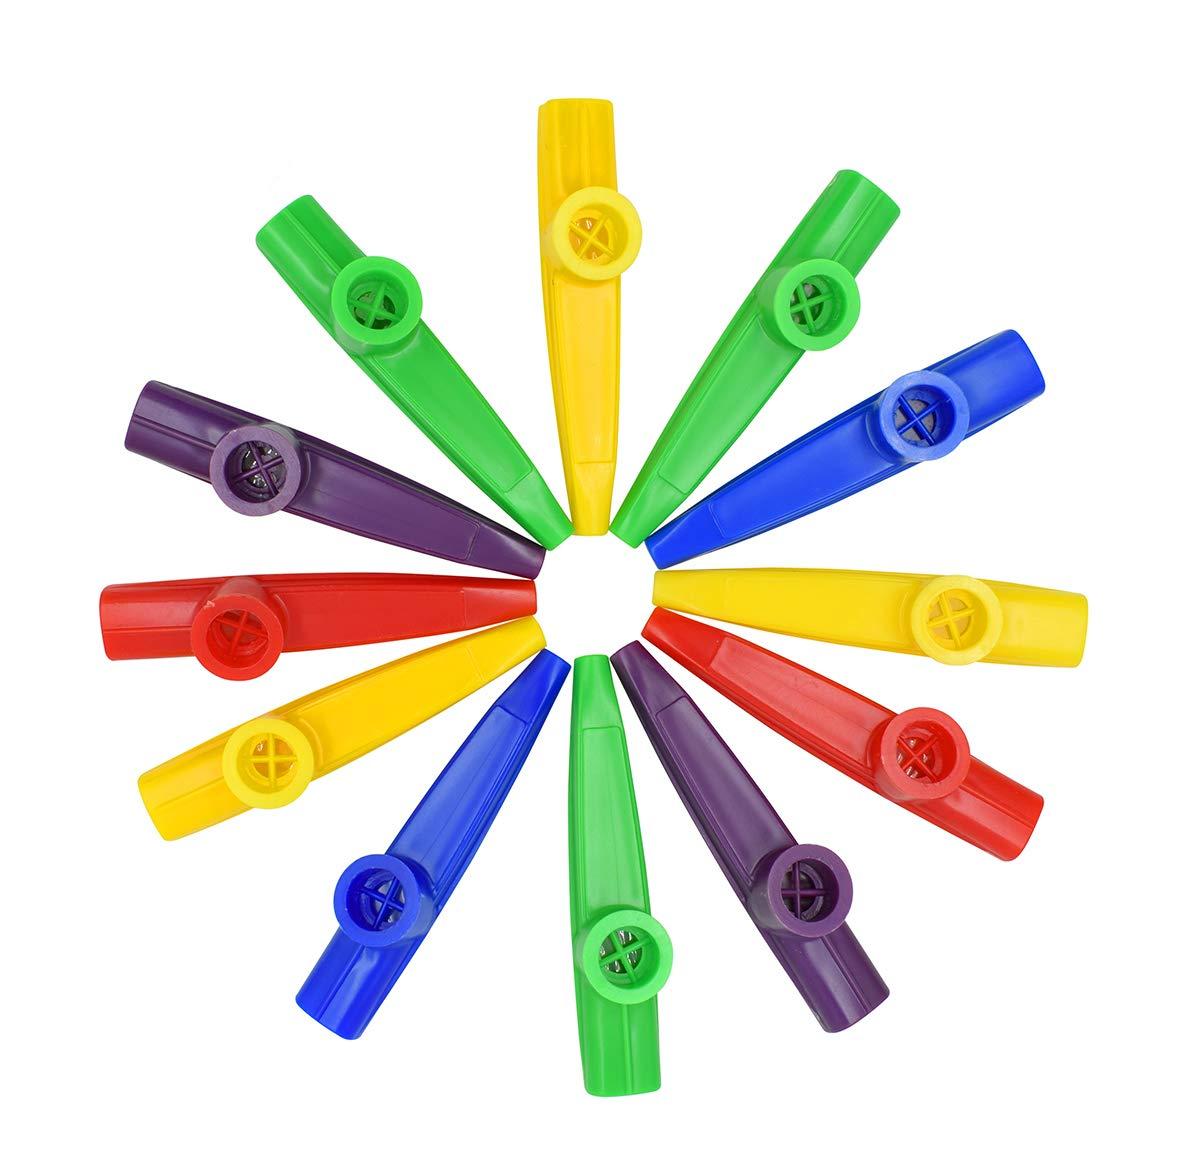 12Pcs Kazoo With 20Pcs Kazoo Flute Diaphragms, Durable Plastic Kazoo Musical Instruments, Good Companion for Guitar, Ukulele, Violin and Keyboard (Yellow, green,blue,red,purple)